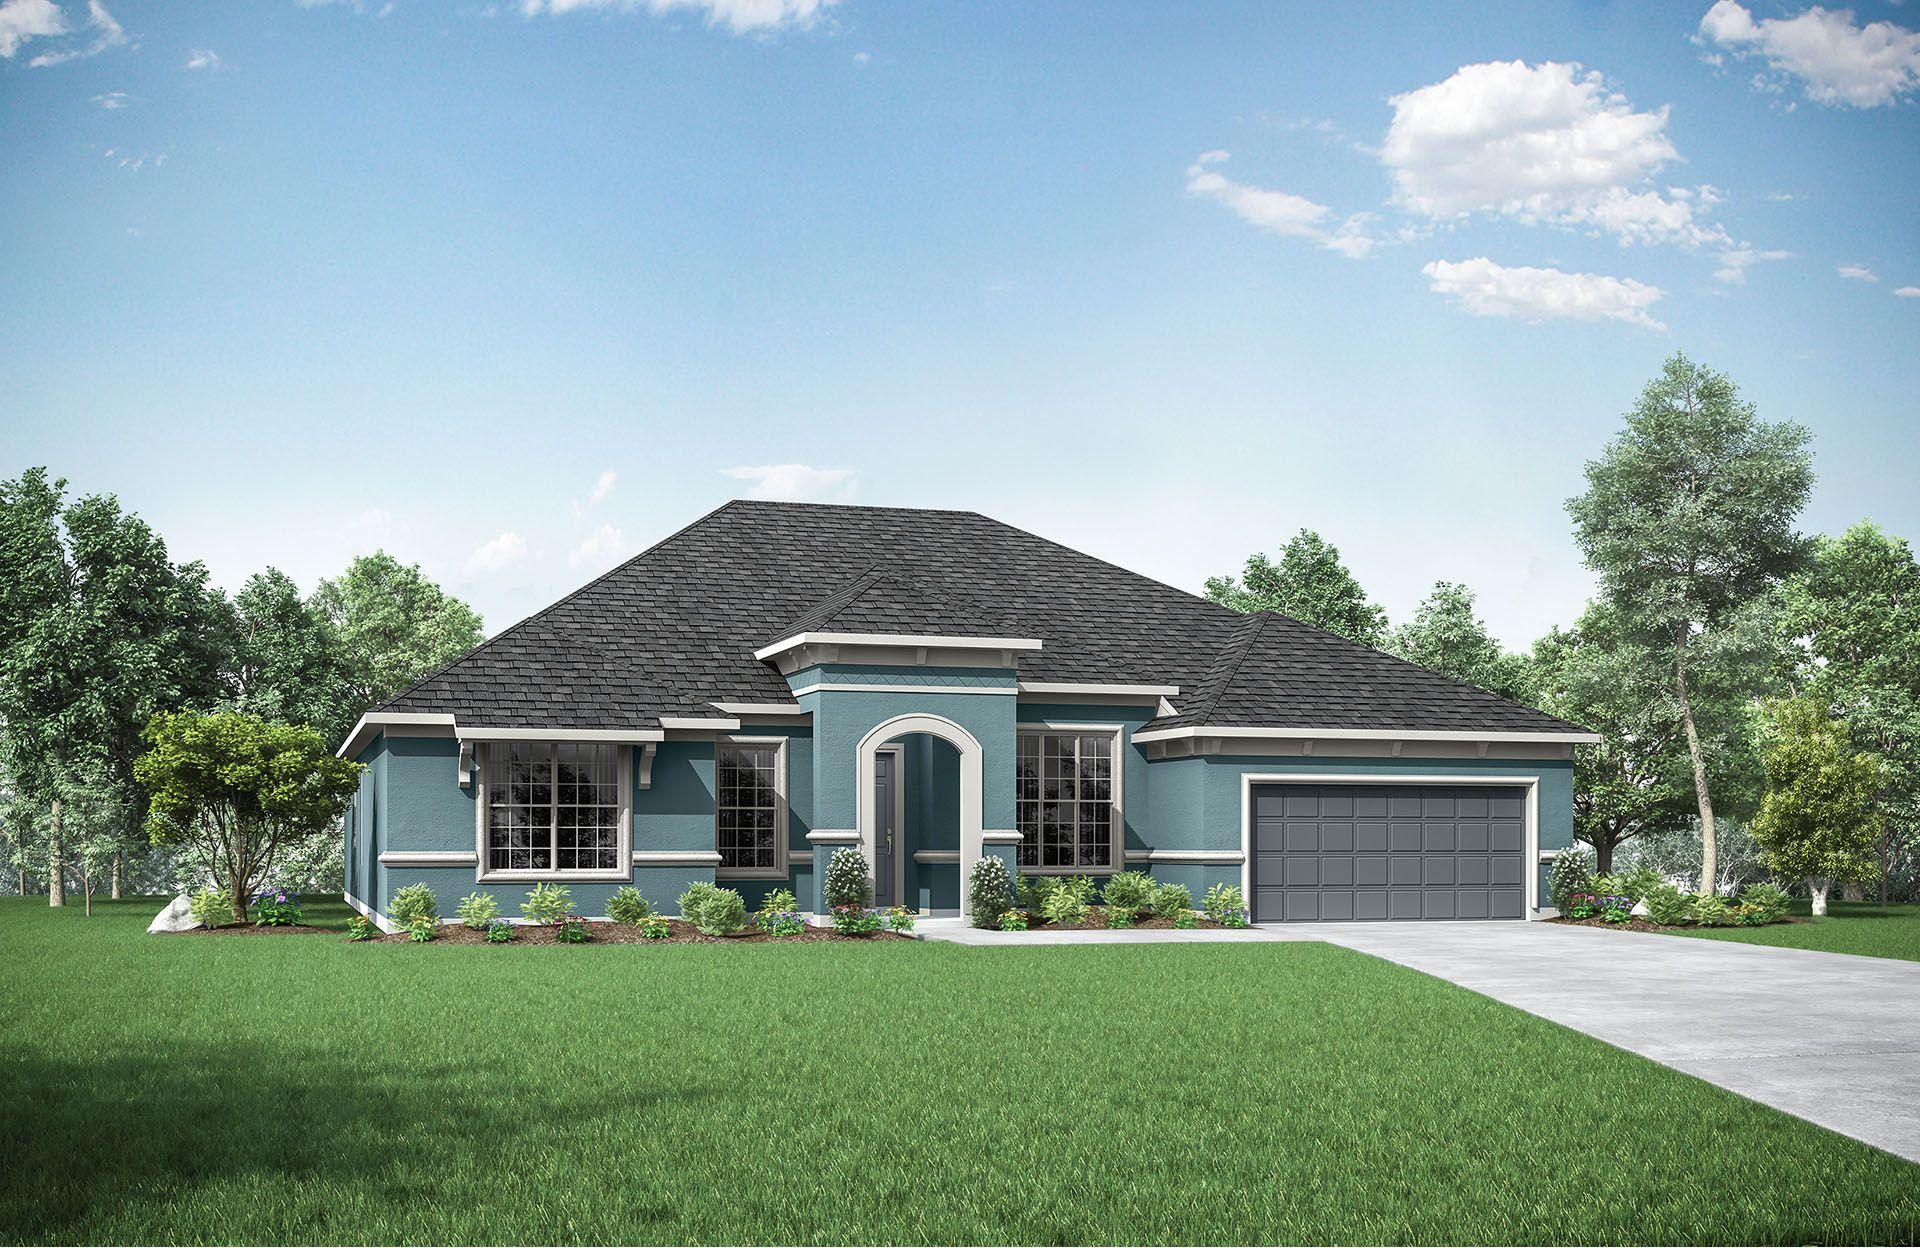 Uma única Família para Venda às Magnolia Point - Durbin 3695 Red Hawk Ct. Green Cove Springs, Florida 32043 United States